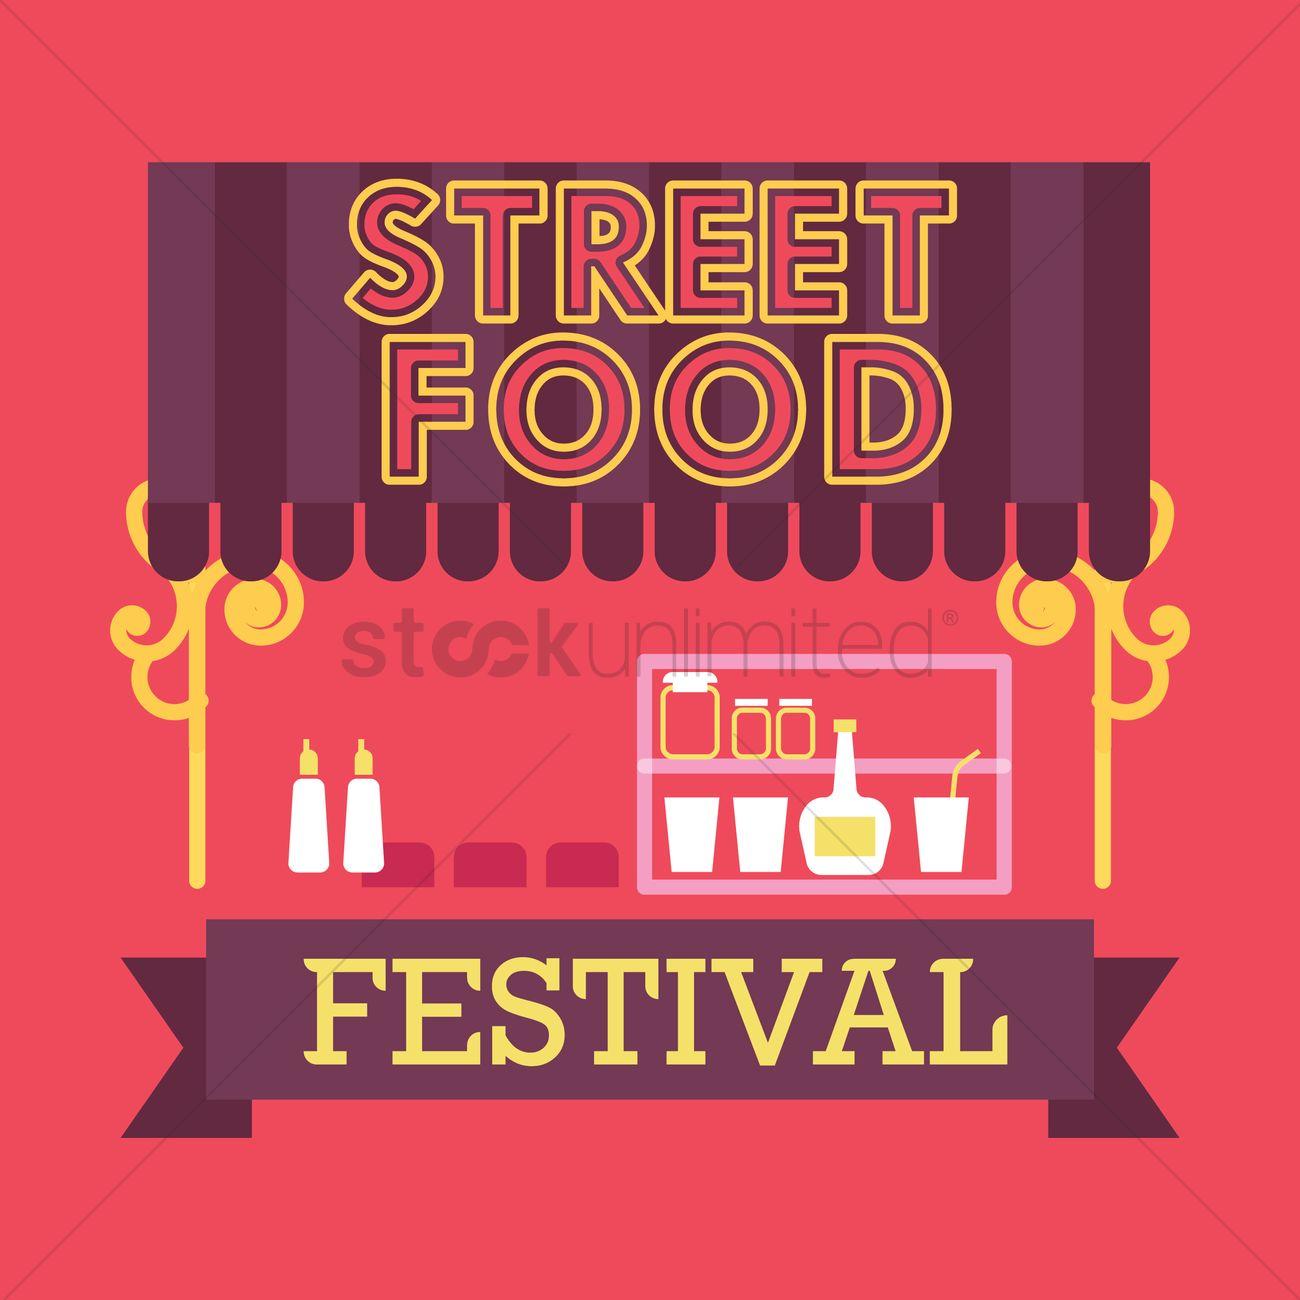 Street Food Festival Design Vector Graphic